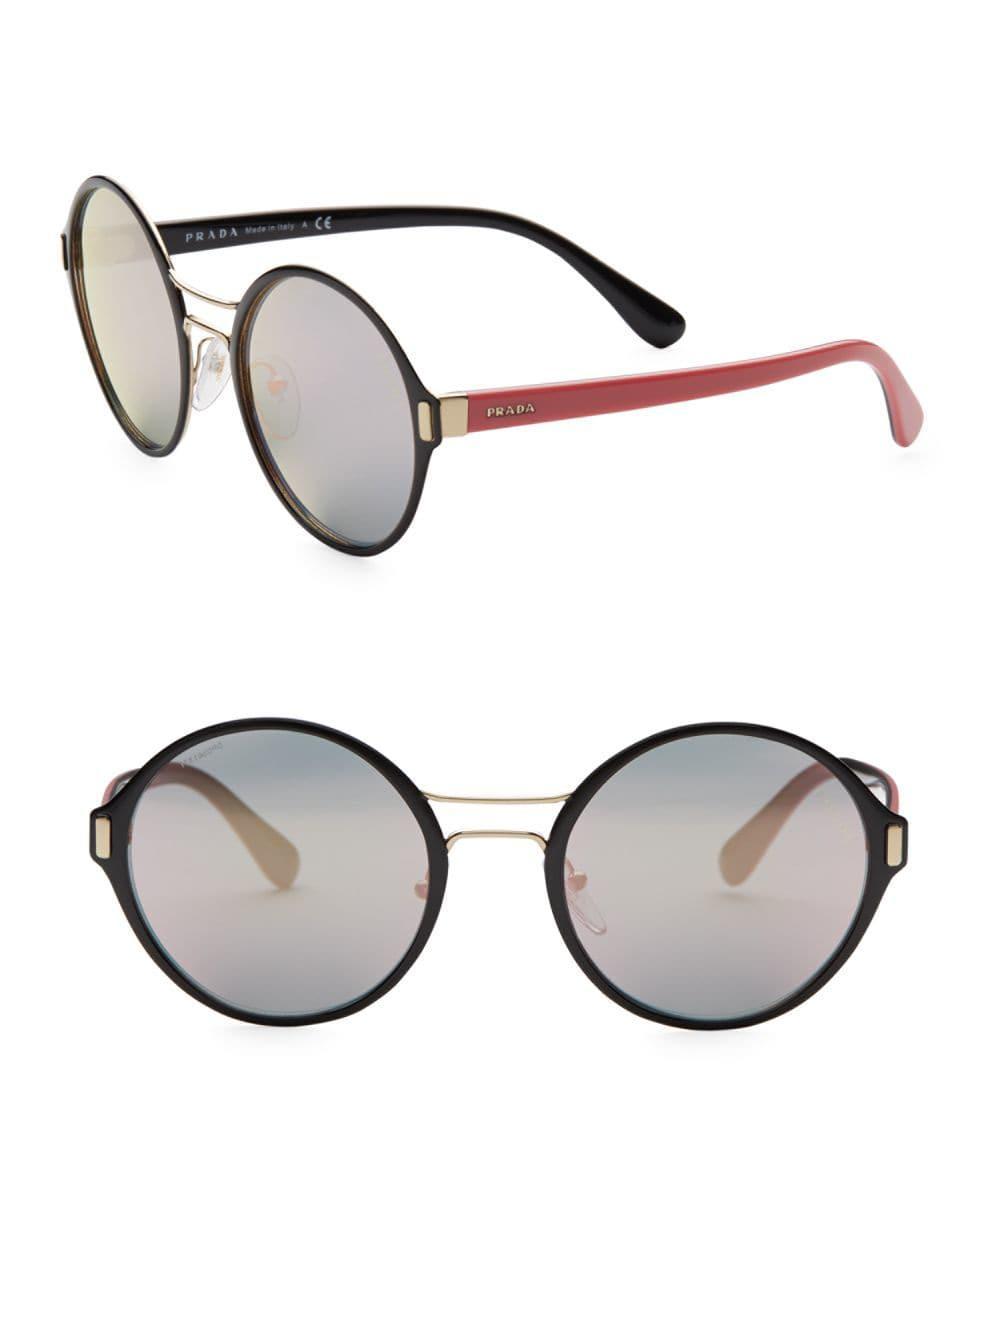 487ff54ca3 Lyst - Prada 54mm Mirrored Round Sunglasses in Metallic